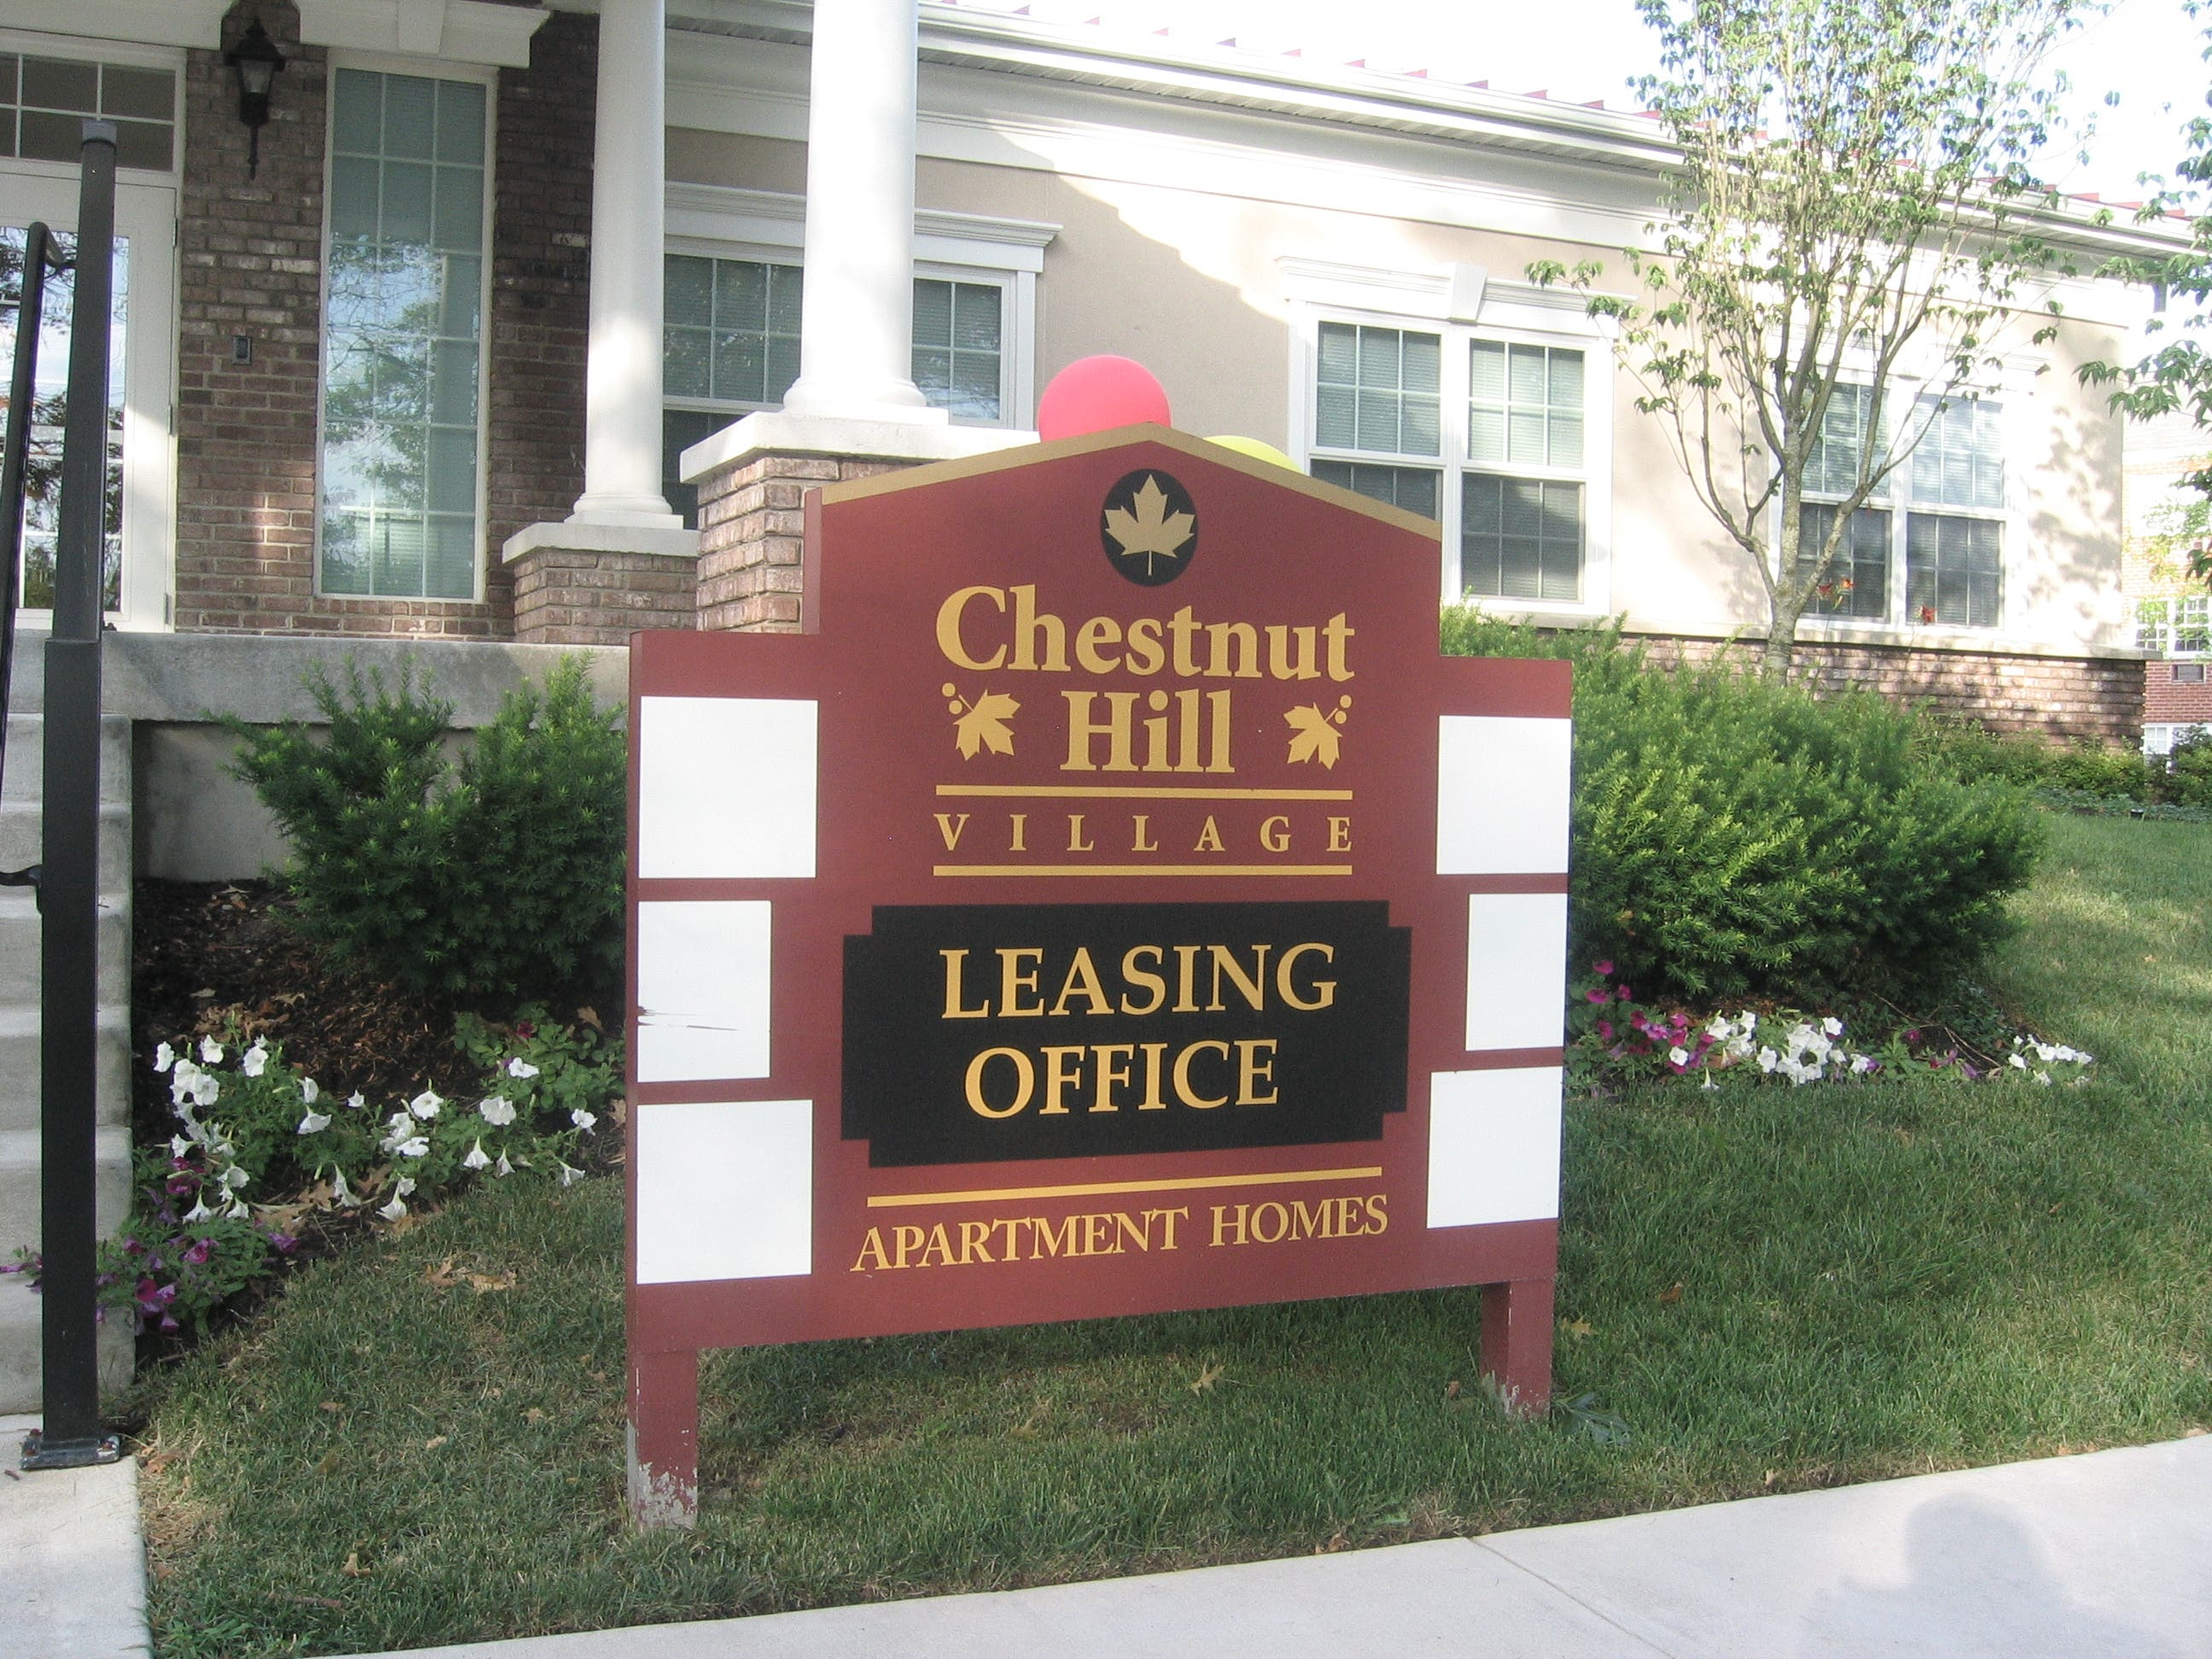 Police Mystery Bullet At Chestnut Hill Village Chestnut Hill Pa